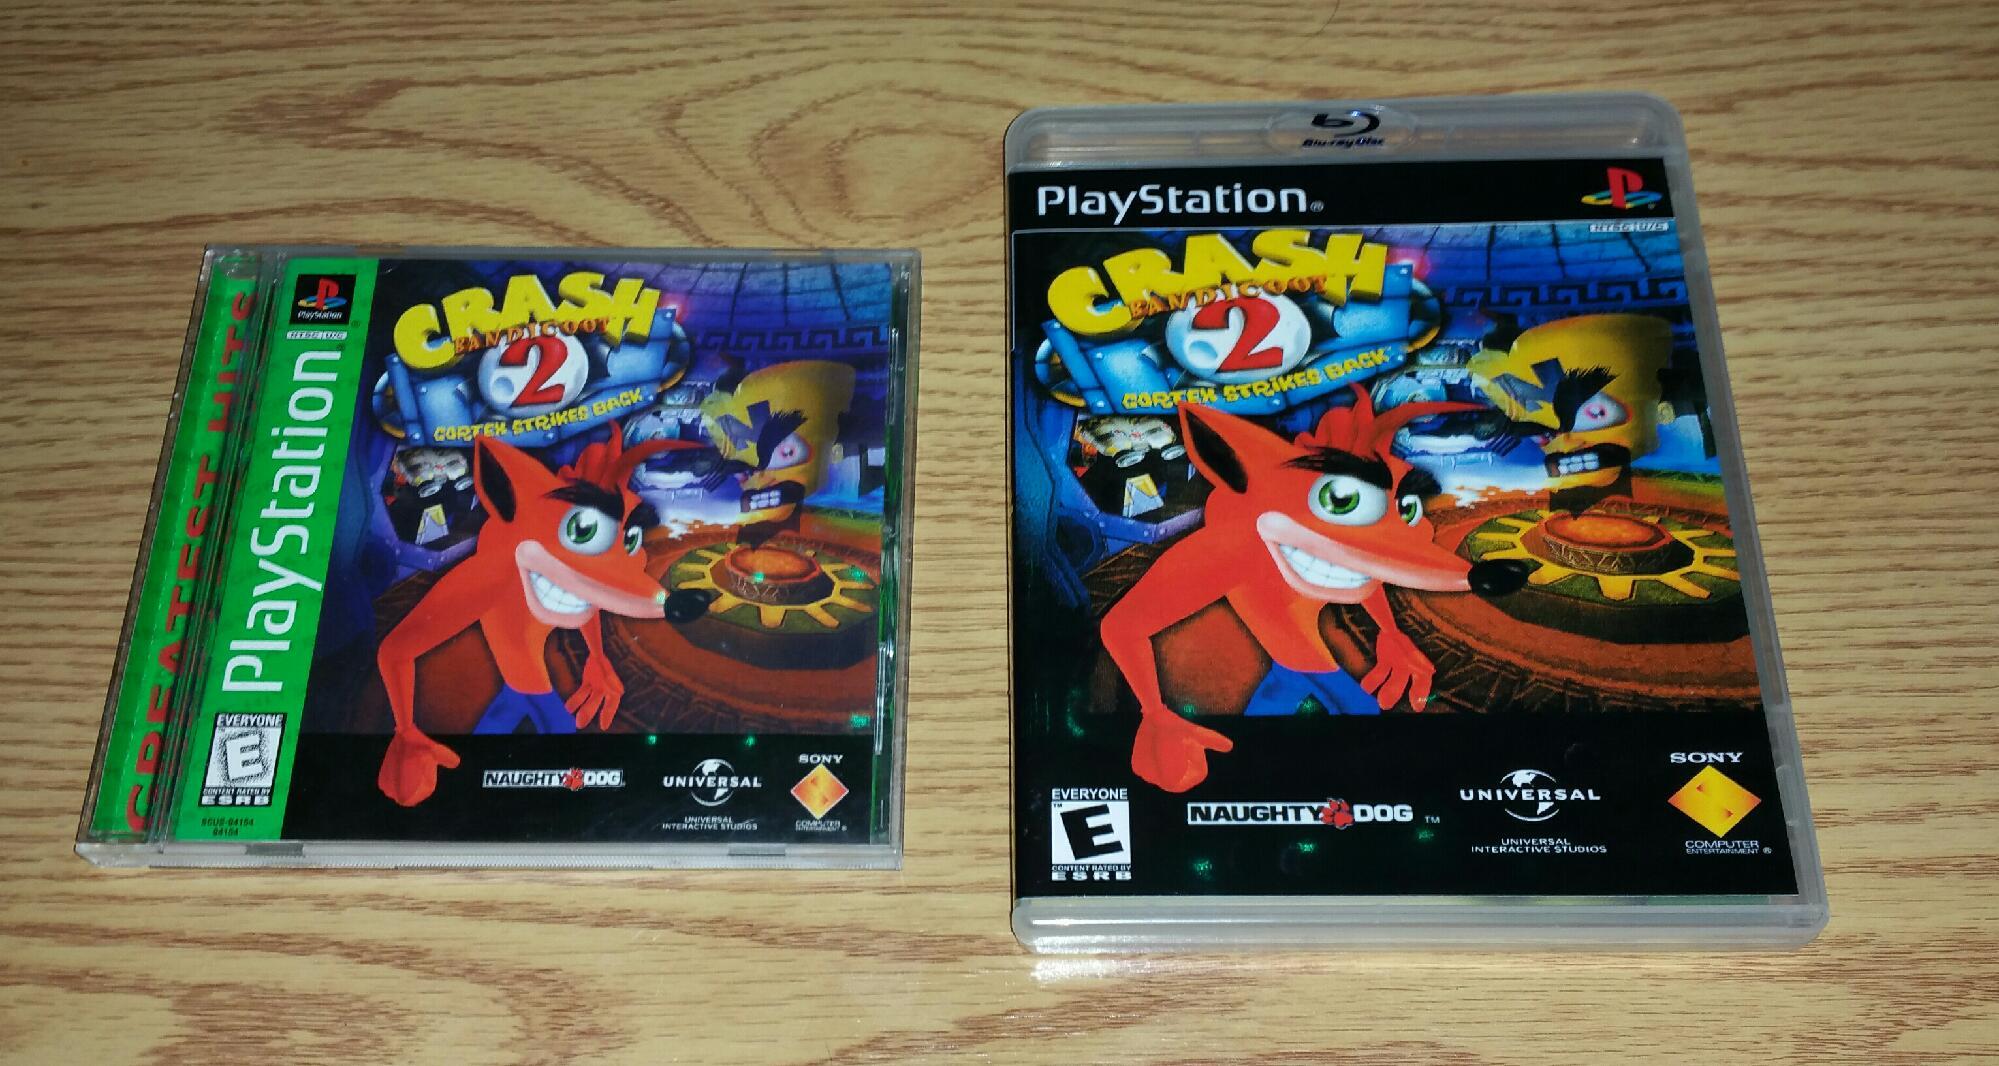 Upgraded PS1 Crash Bandicoot cases 😎